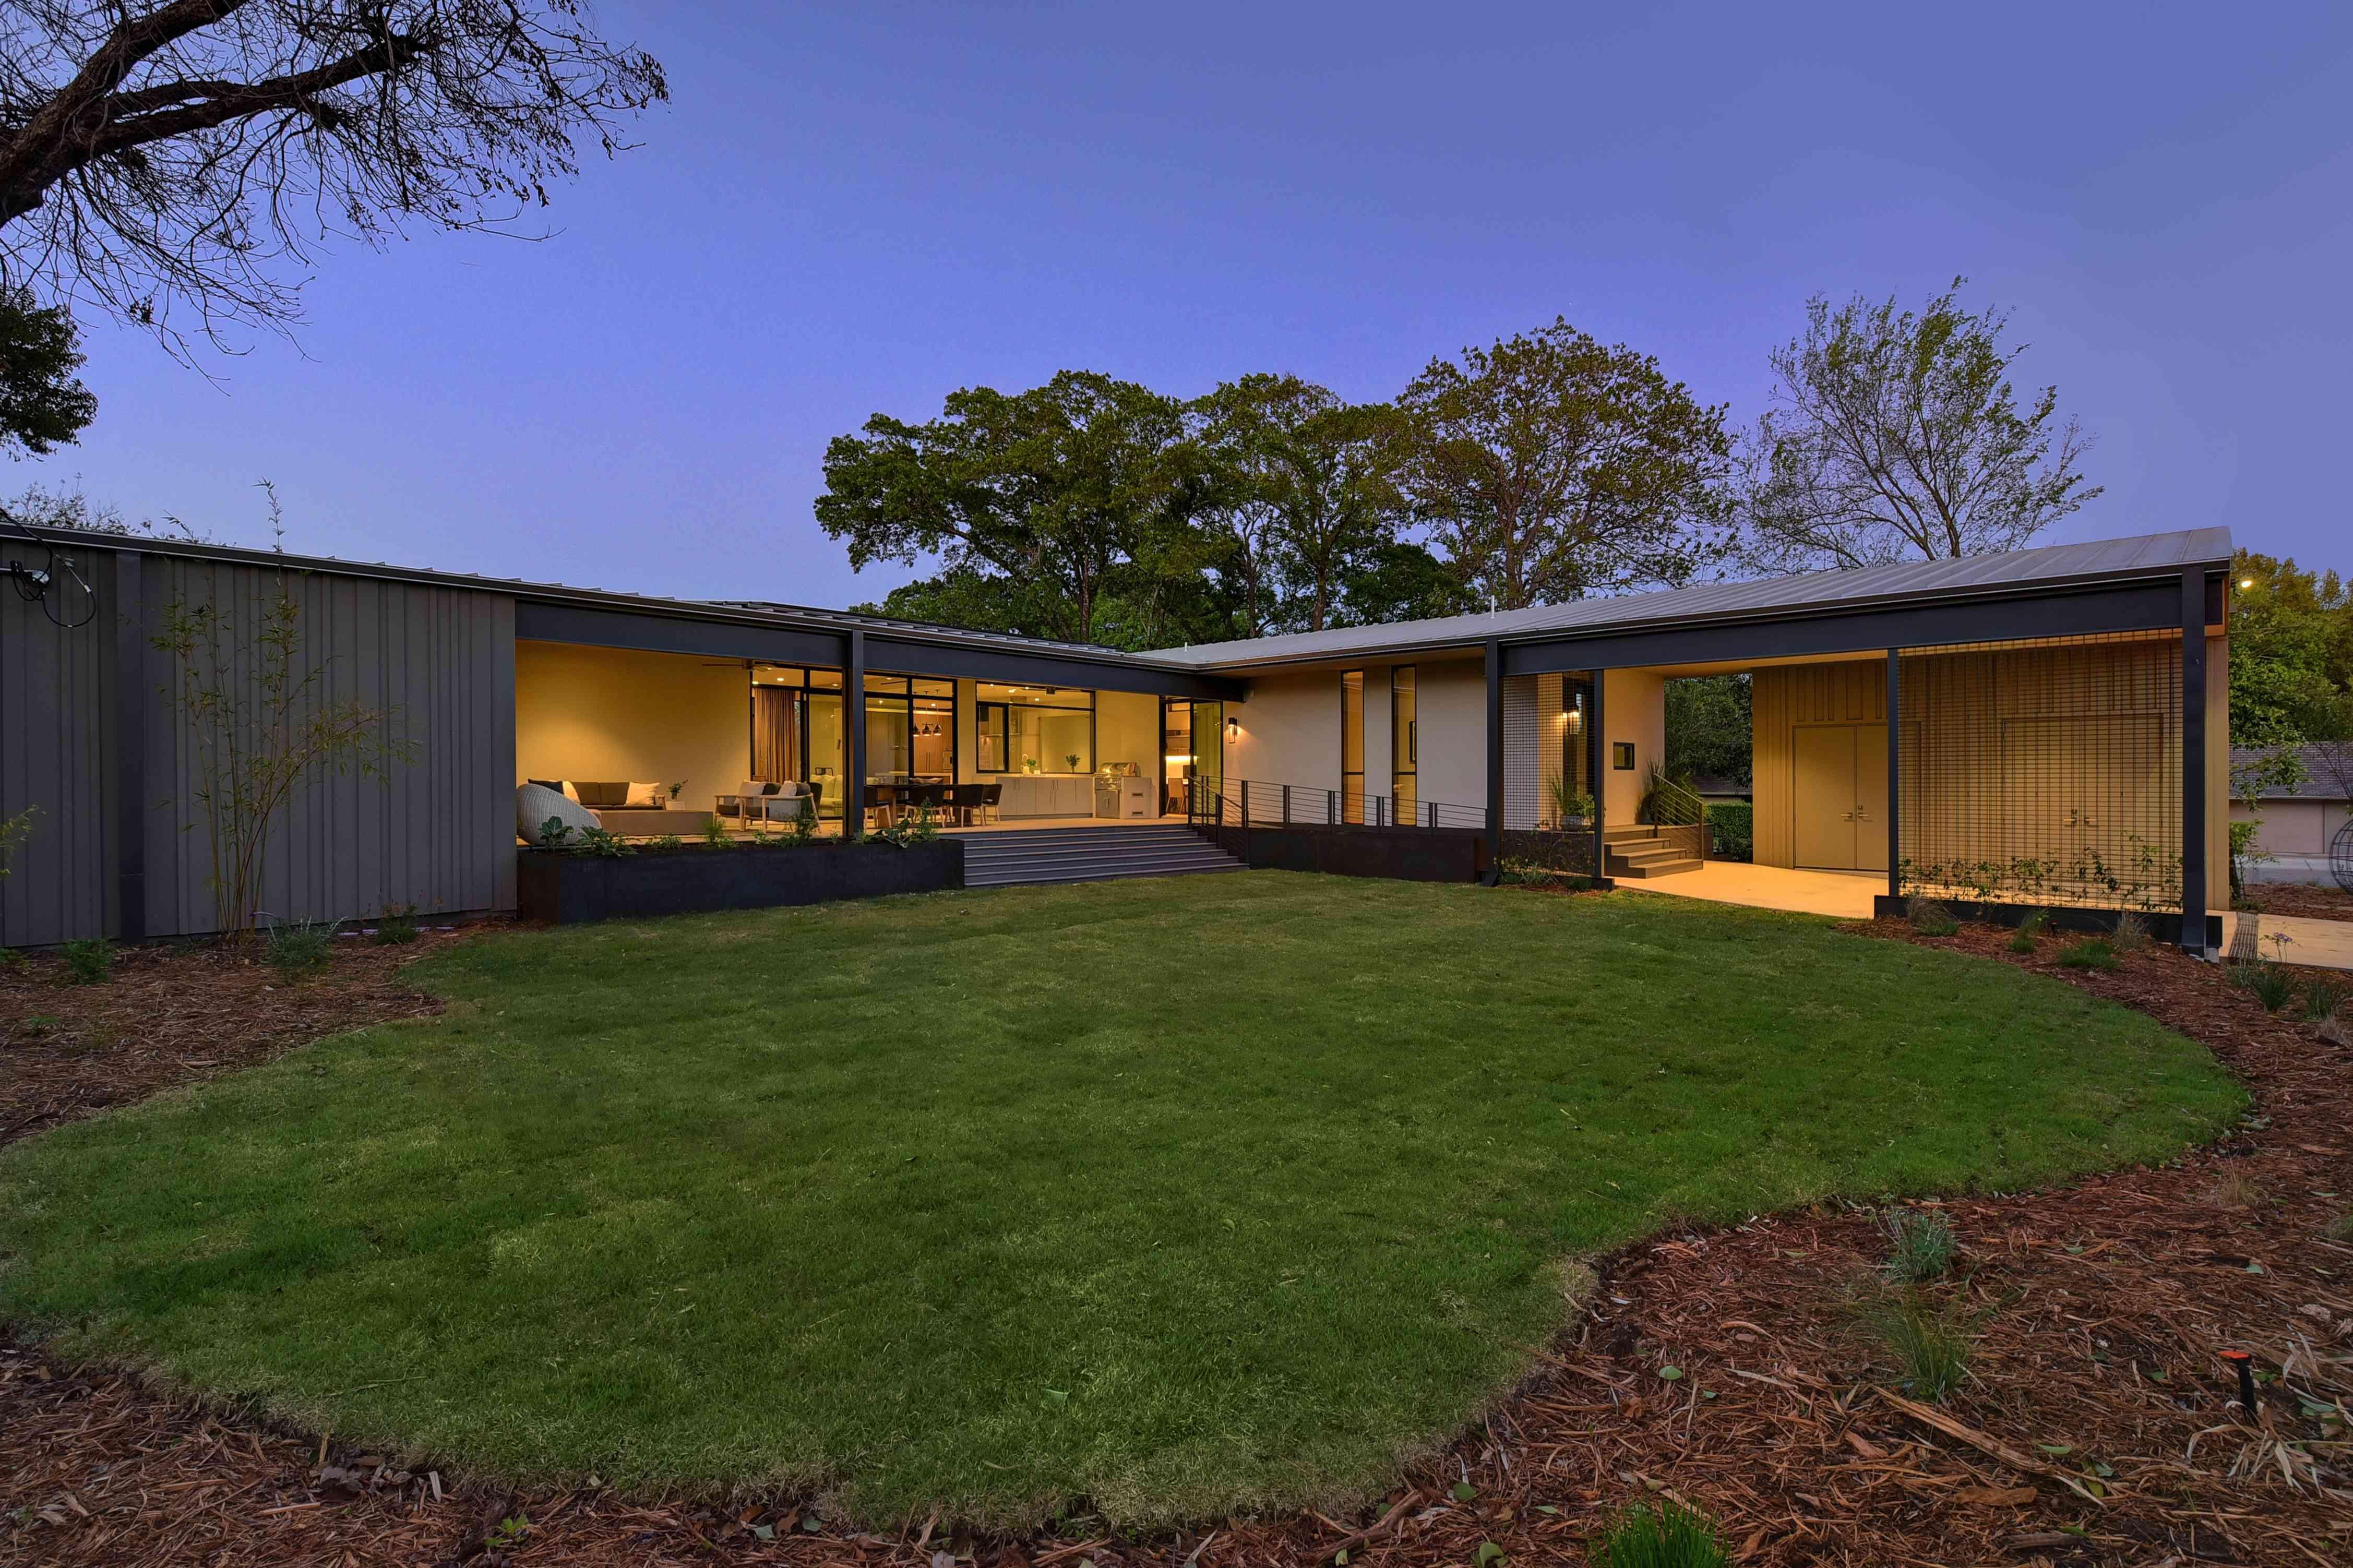 The WELL home of designer Laura Britt, in Austin, TX for Designer Digs